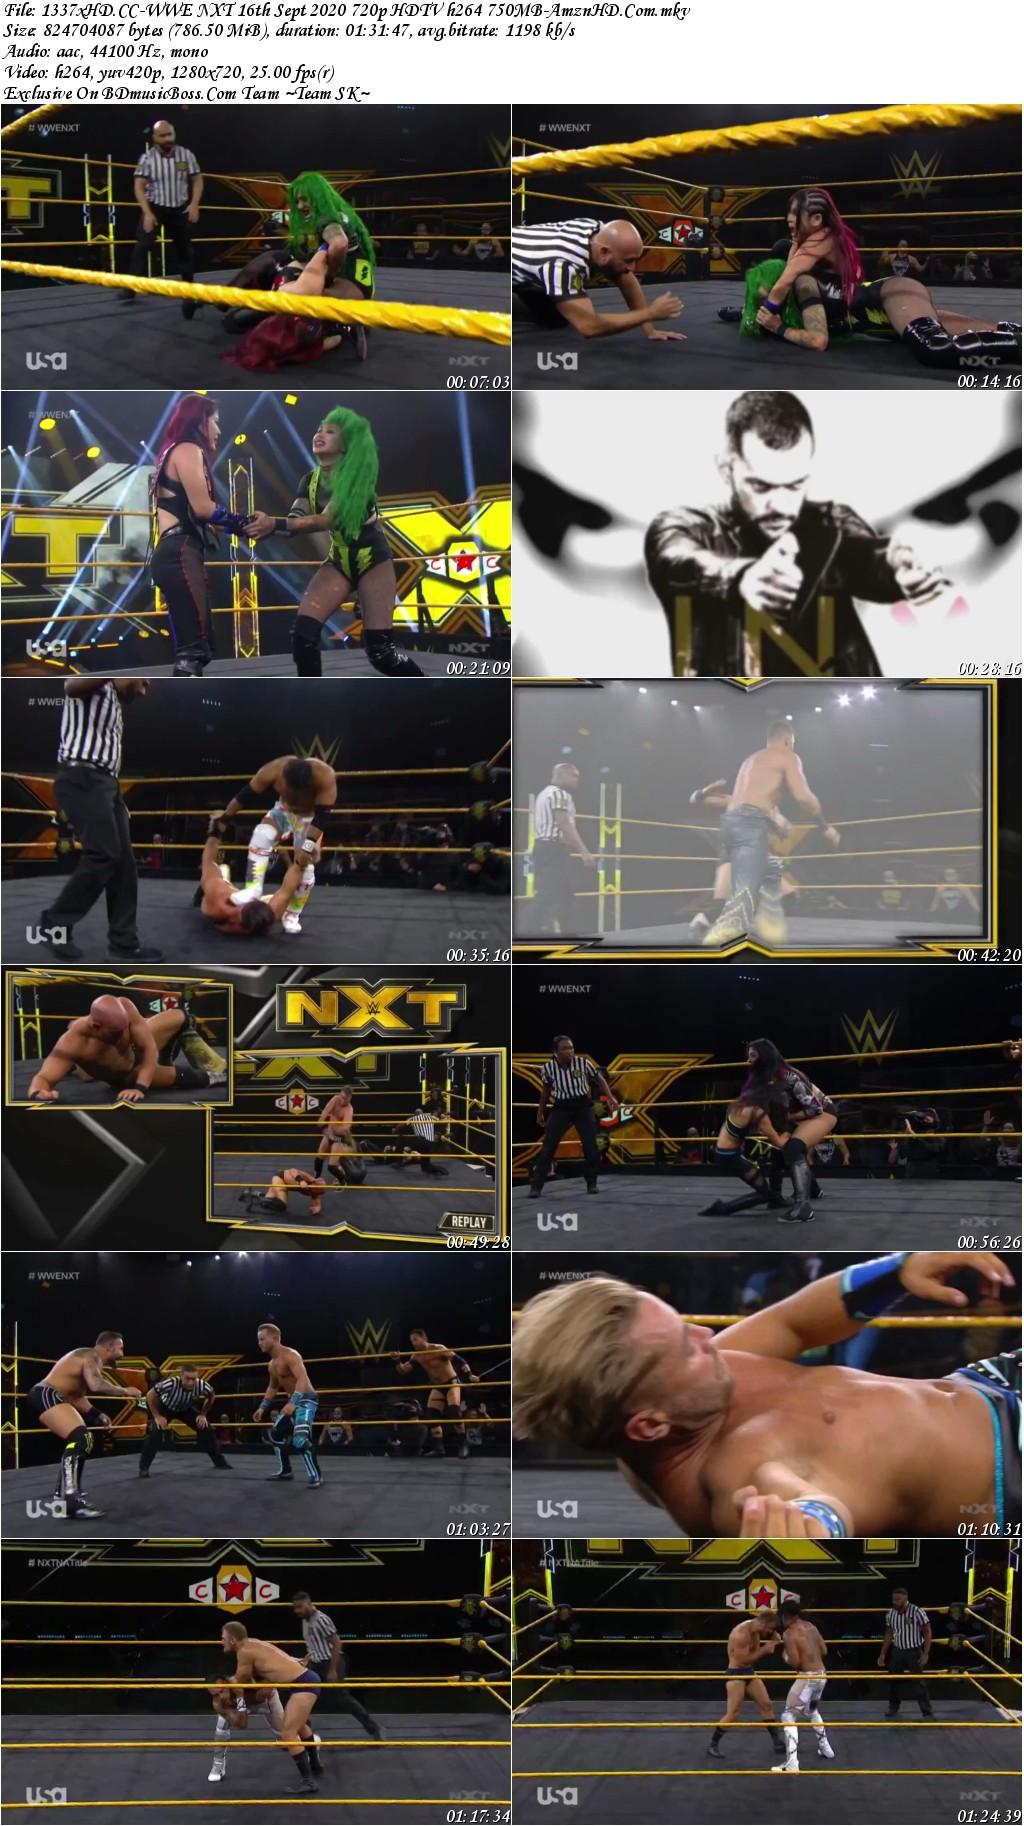 1337x-HD-CC-WWE-NXT-16th-Sept-2020-720p-HDTV-h264-750-MB-Amzn-HD-Com-s